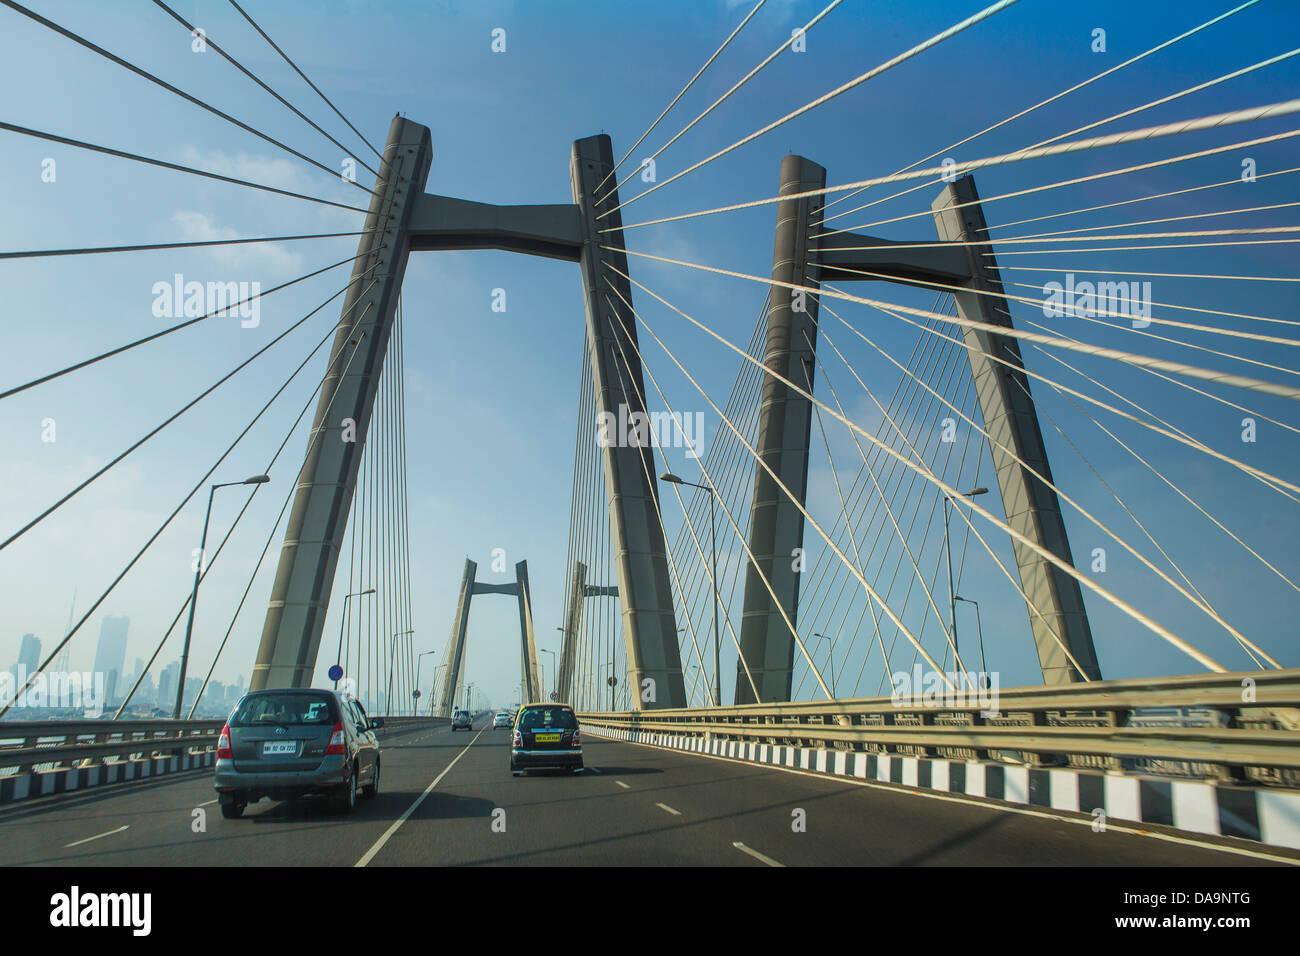 India, South India, Asia, Maharashtra, Mumbai, Bombay, City, Sea Link, Bandra Worli, architecture, bridge, new, - Stock Image